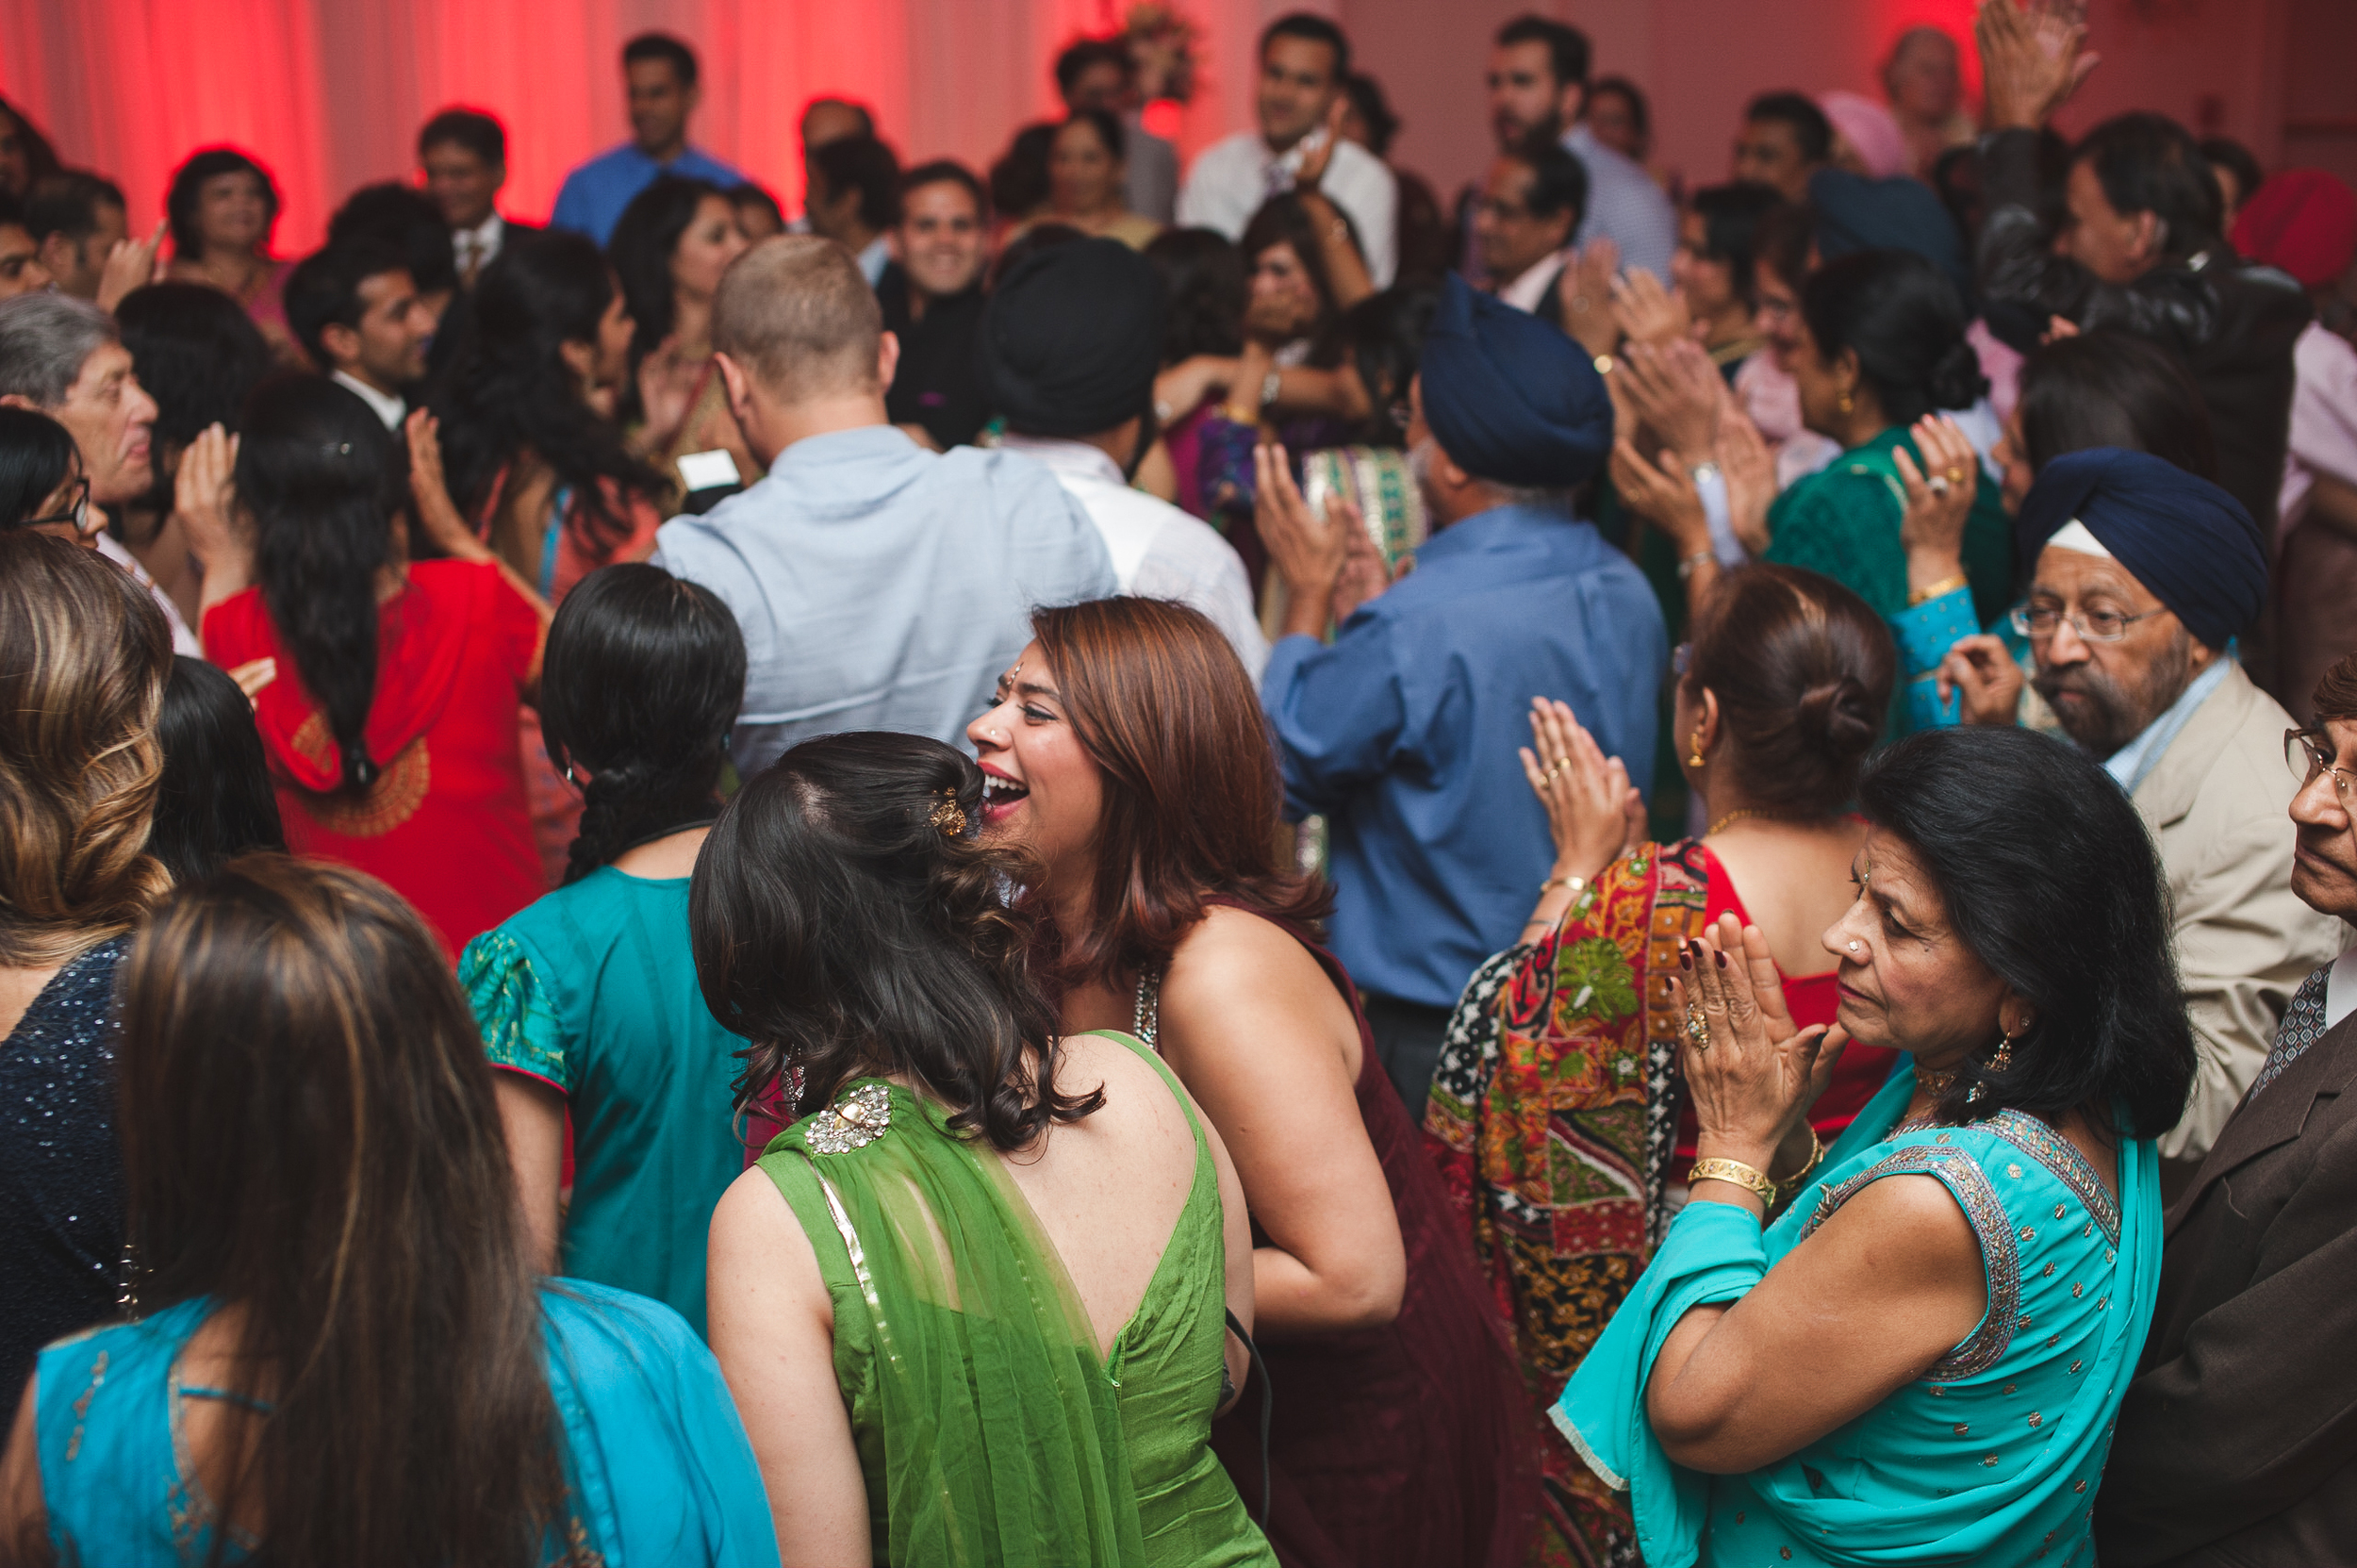 Indian wedding photographer washington dc Mantas Kubilinskas-6.jpg